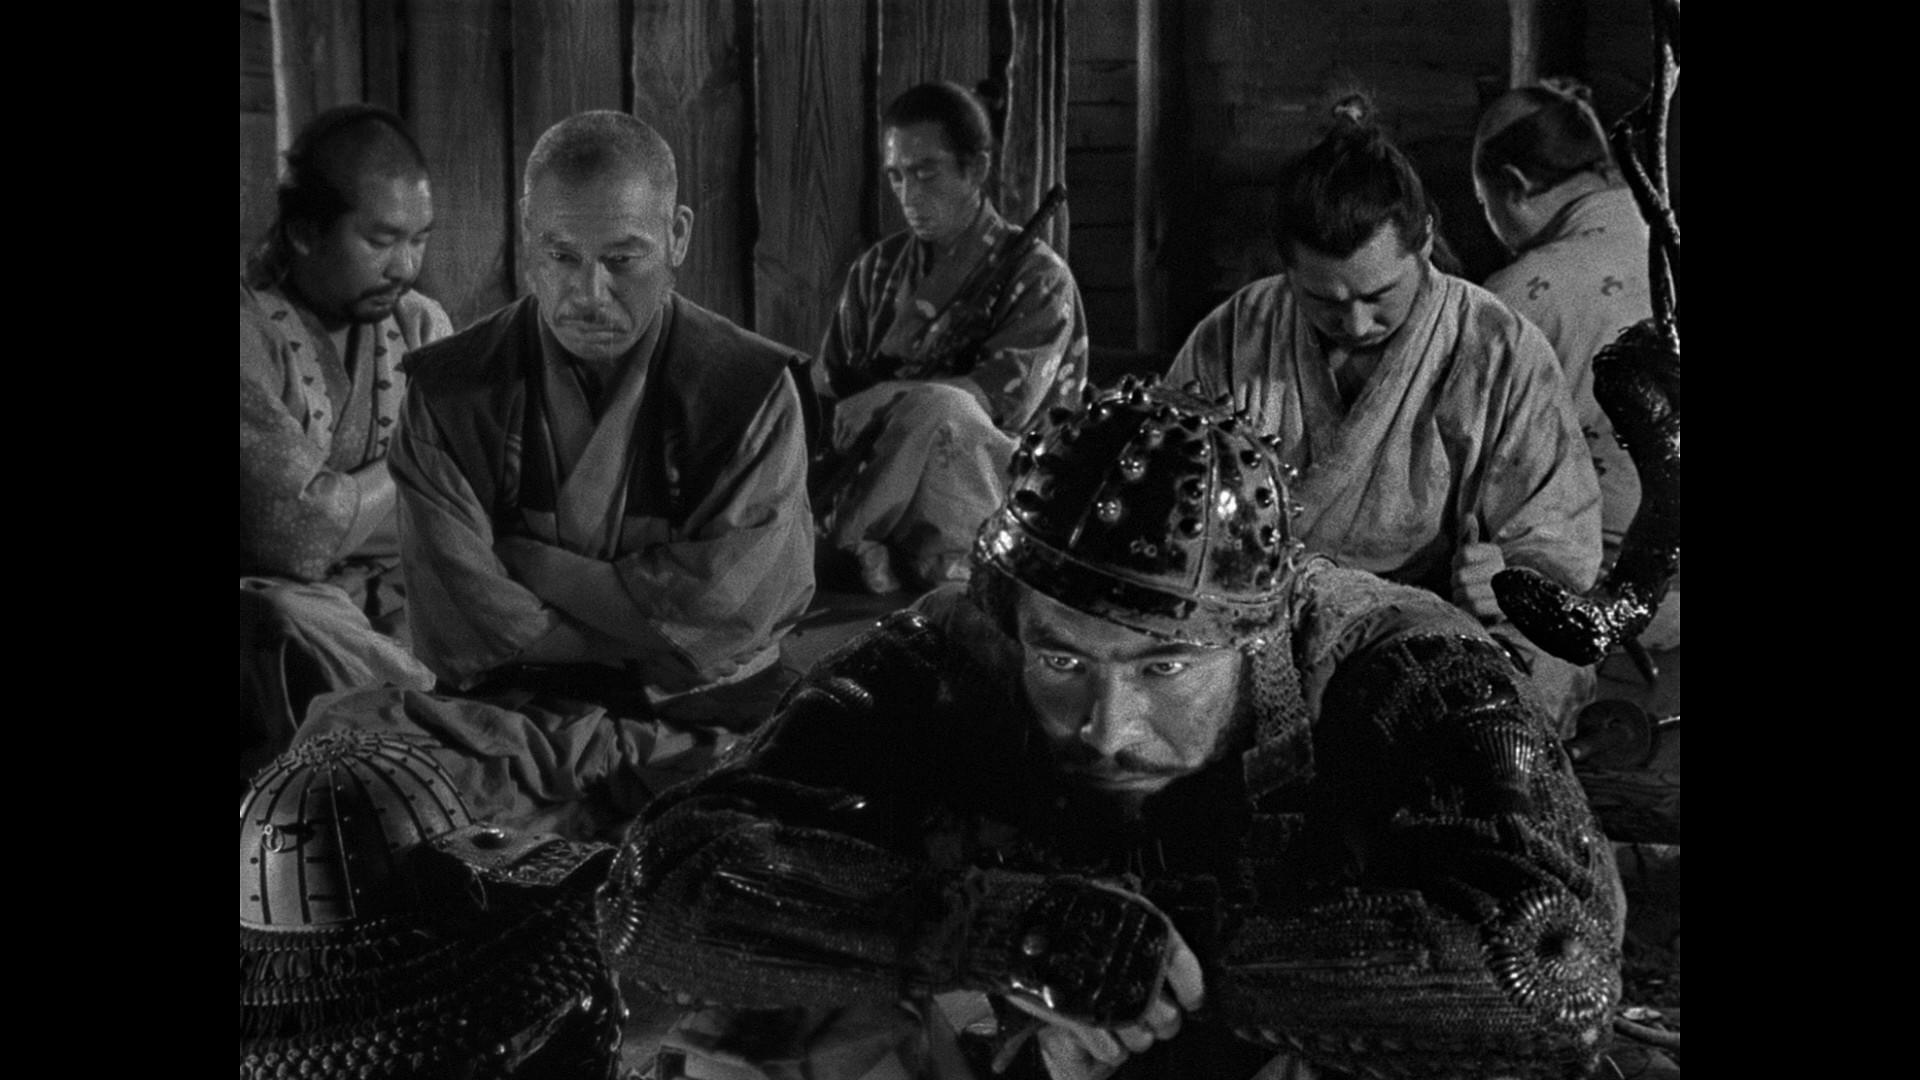 (Akira Kurosawa, 1954) · Kurosawa's classic story of seven ronin who band  together to protect a small farm community was the first of his samurai  films.